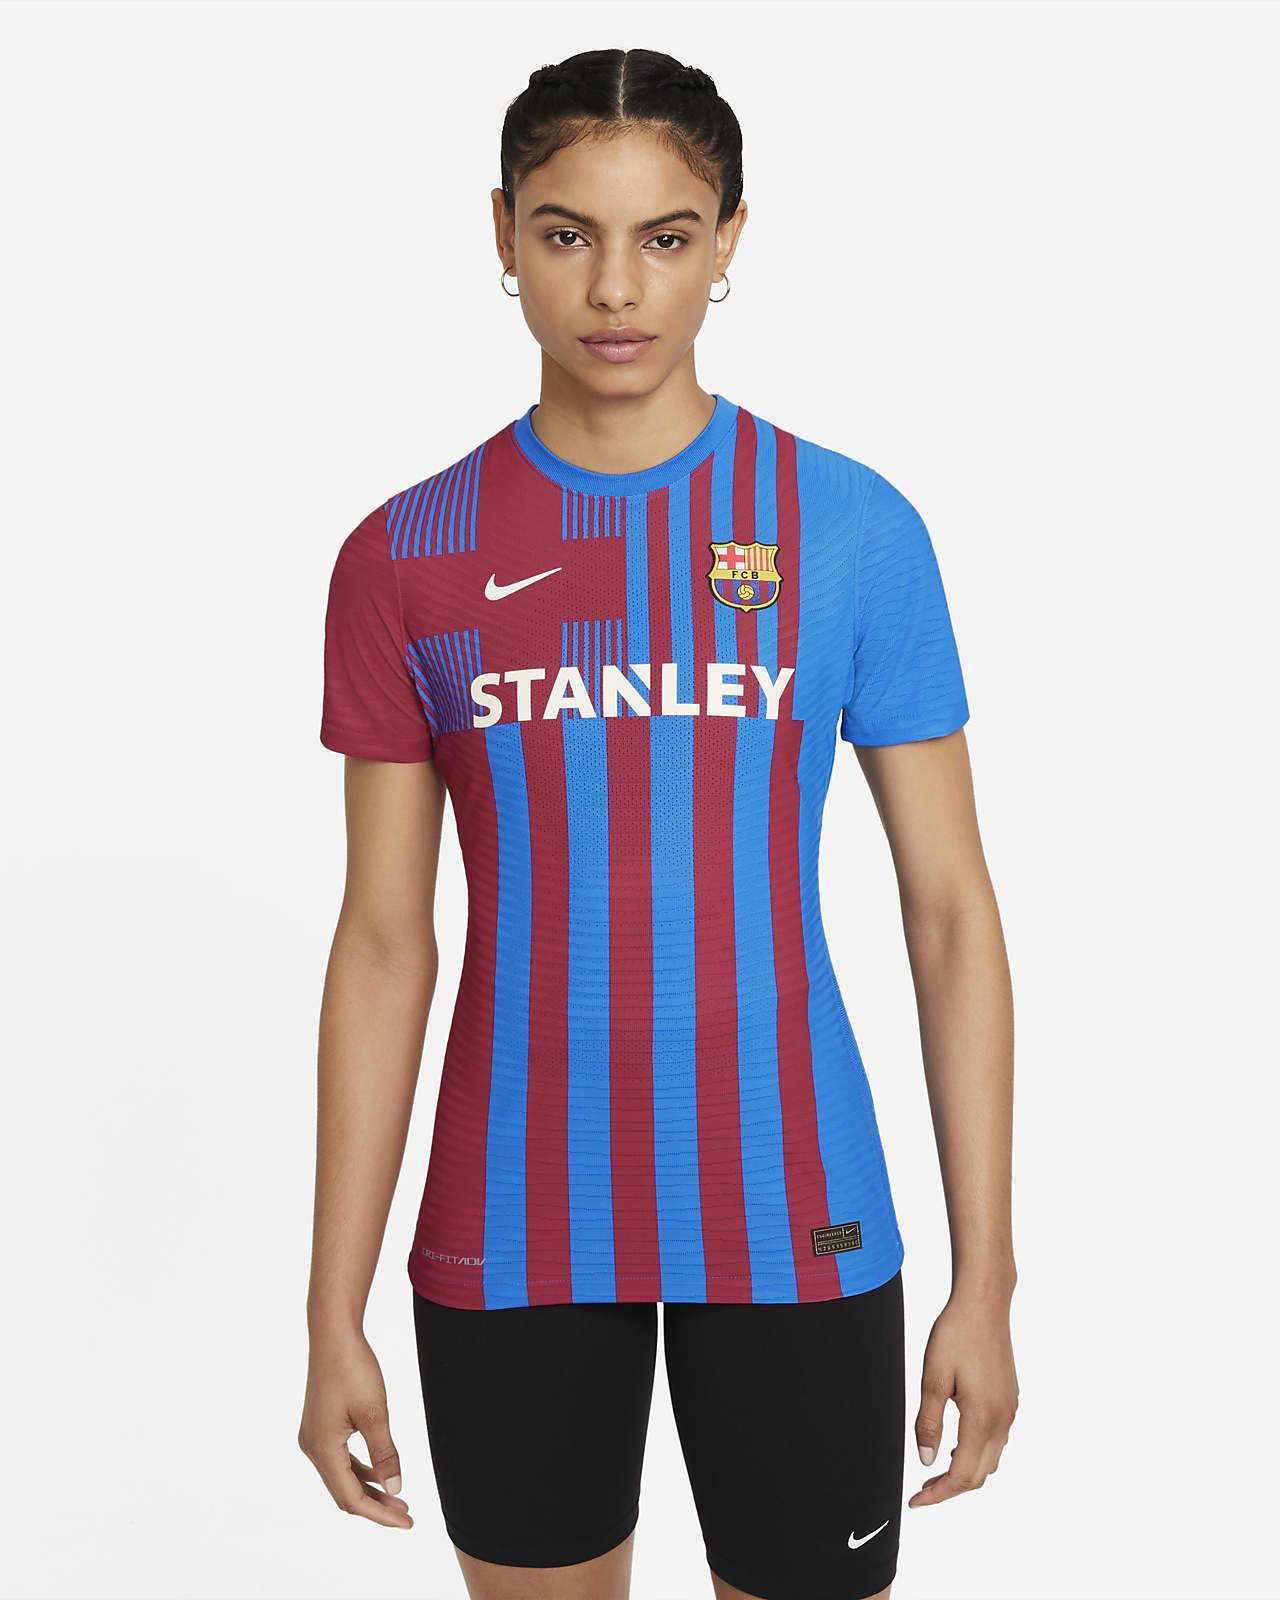 F.C. Barcelona 2021/22 Match Home Women's Nike Dri-FIT ADV Football Shirt